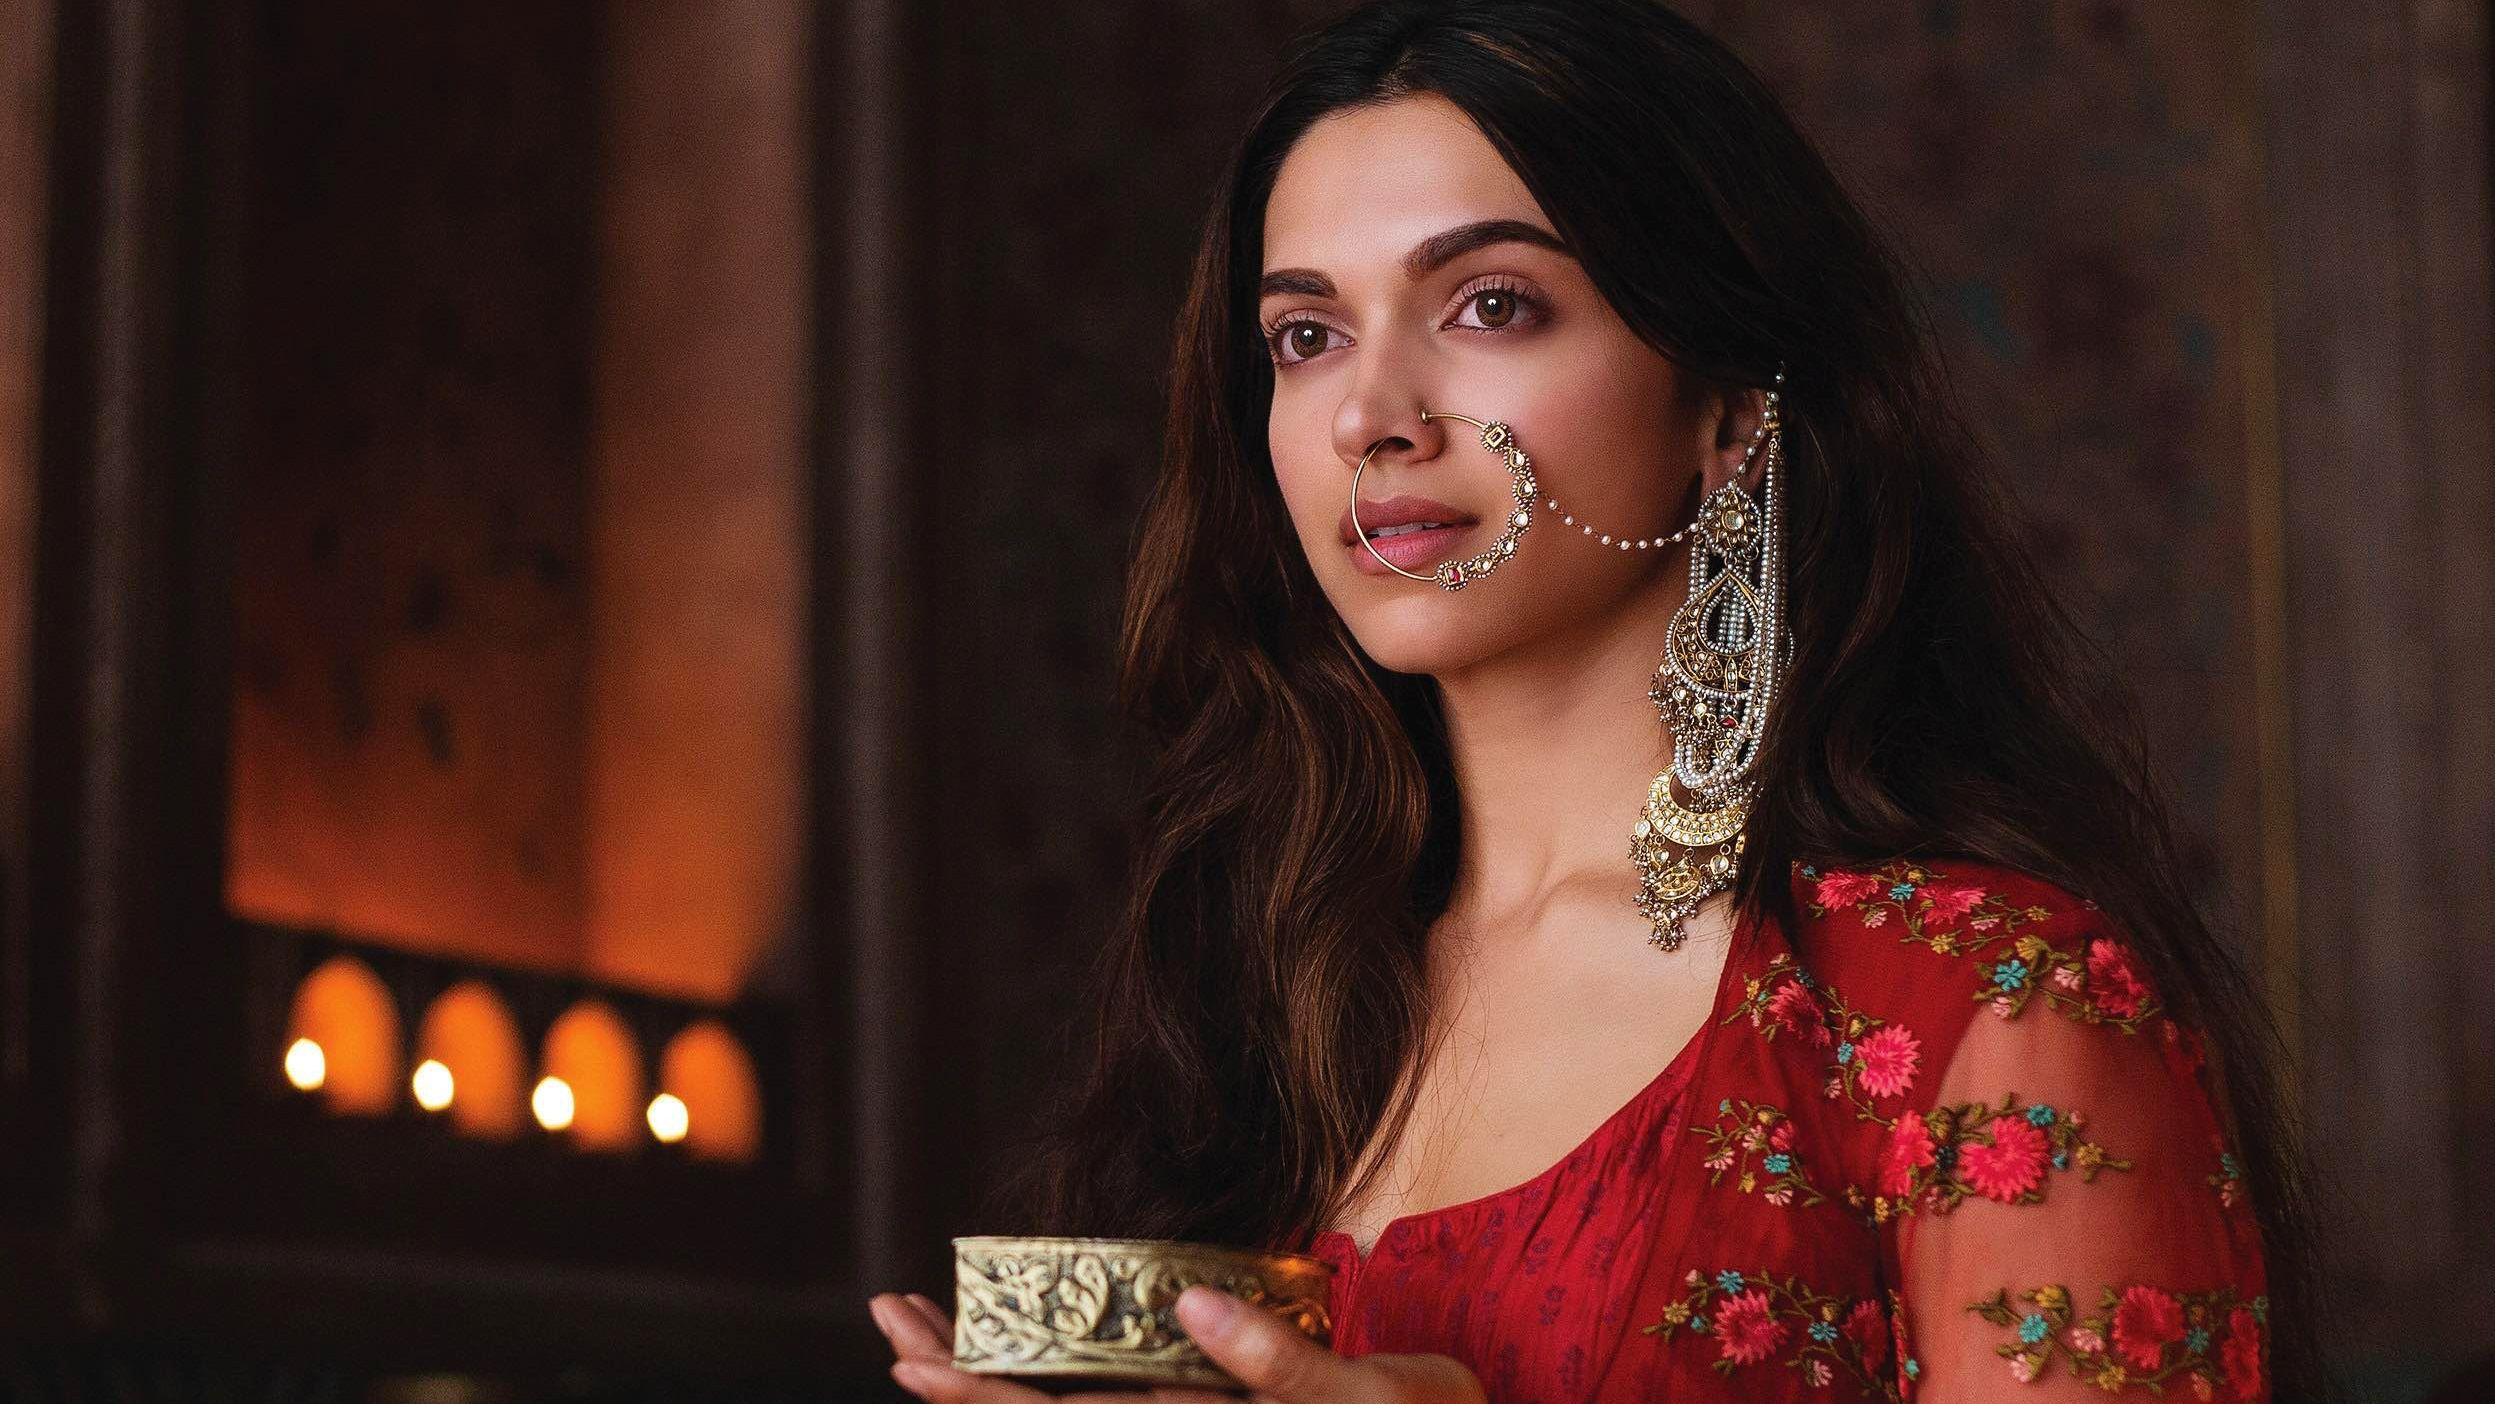 Image Result For Deepika Padukone In Bajirao Mastani Images Deepika Padukone Mastani Bollywood